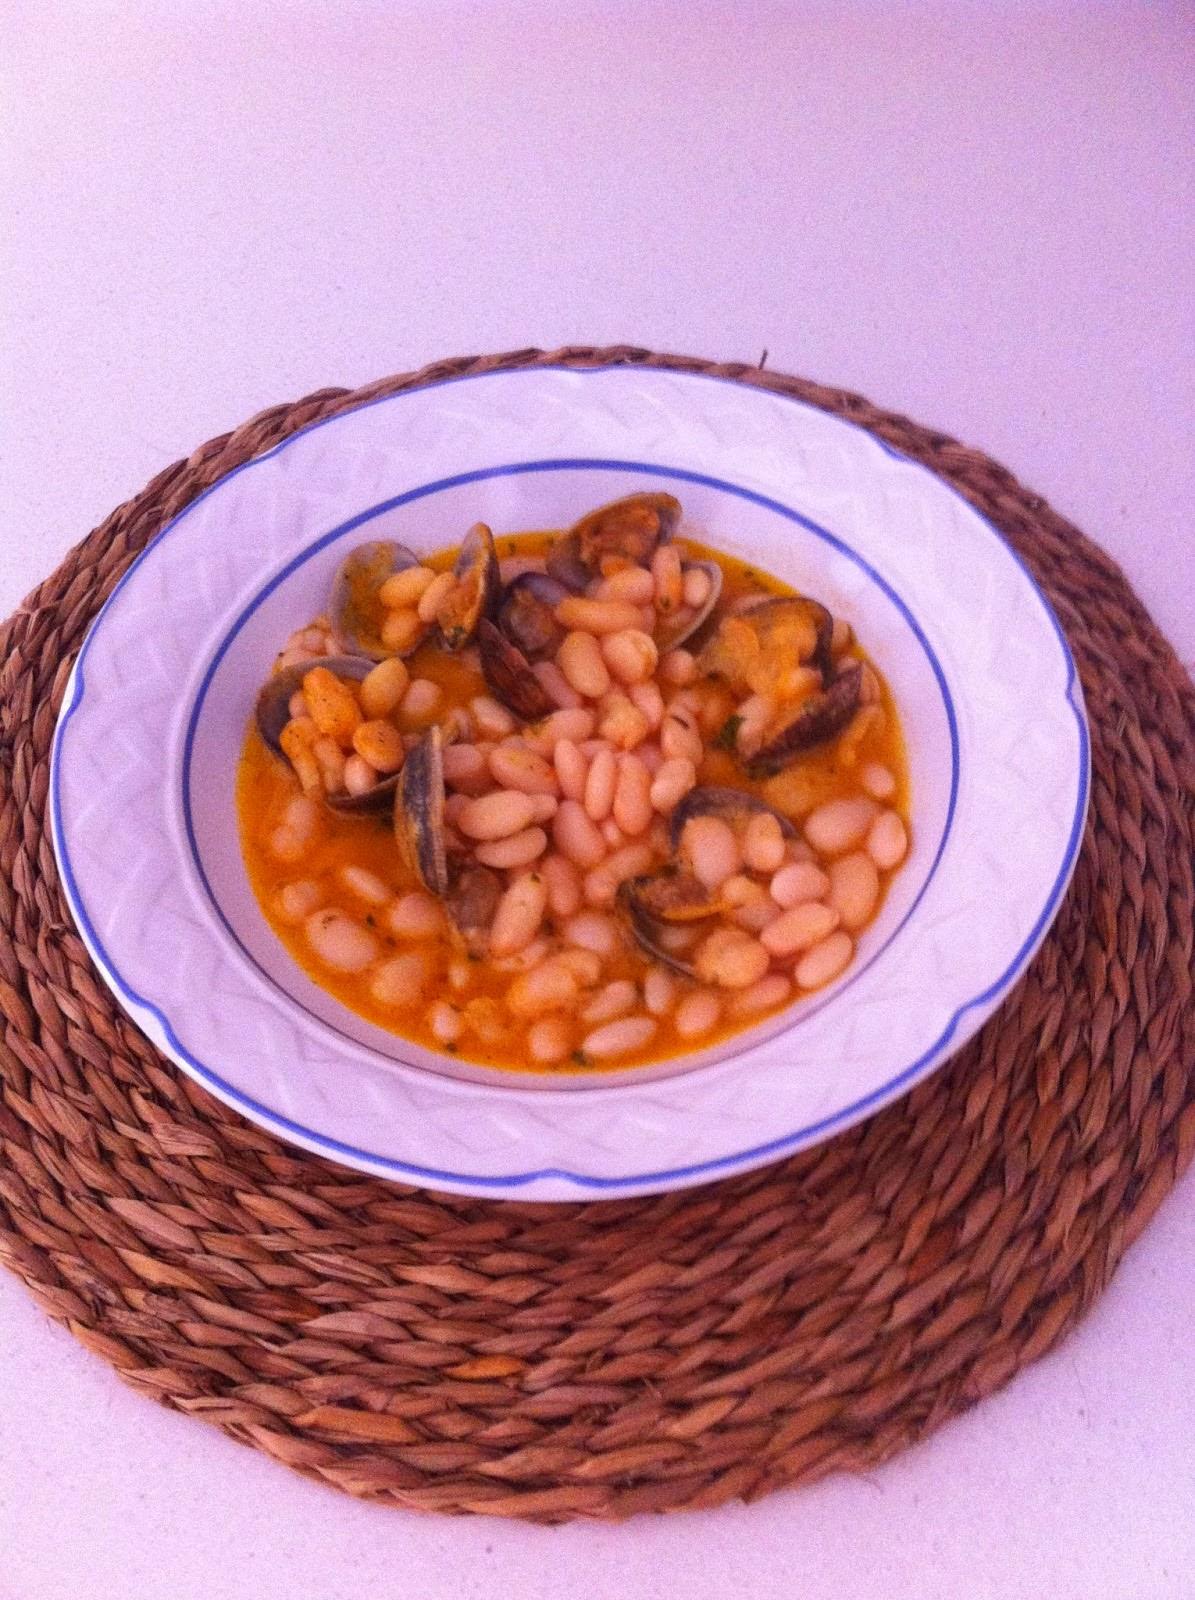 http://lashermanasyunamarx.blogspot.com.es/2014/09/judias-con-chirlas.html